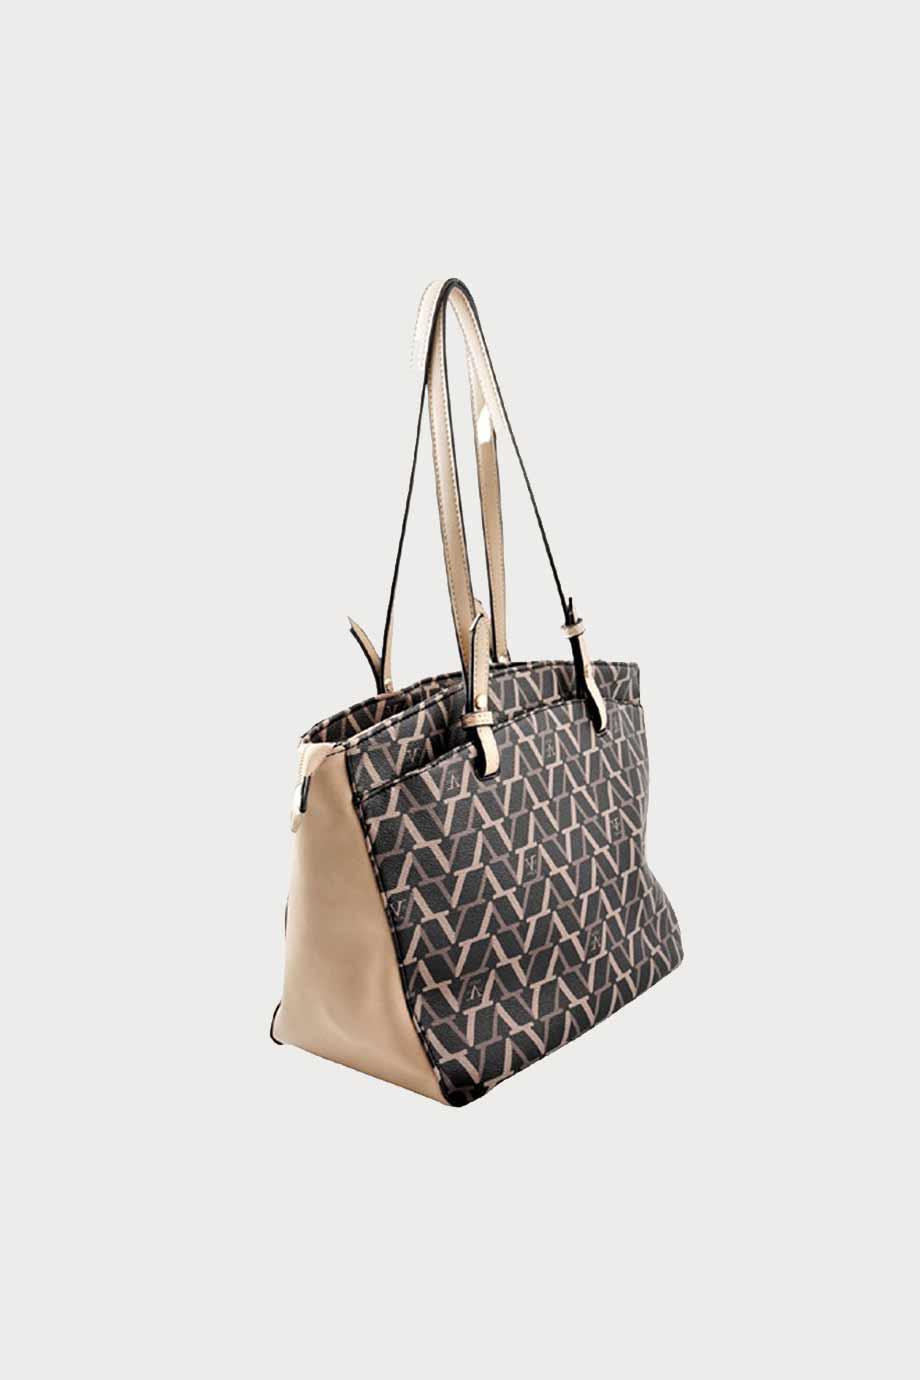 spiridoula metheniti shoes xalkida p ss20 7710v eco leather bag black beige 19v69 3